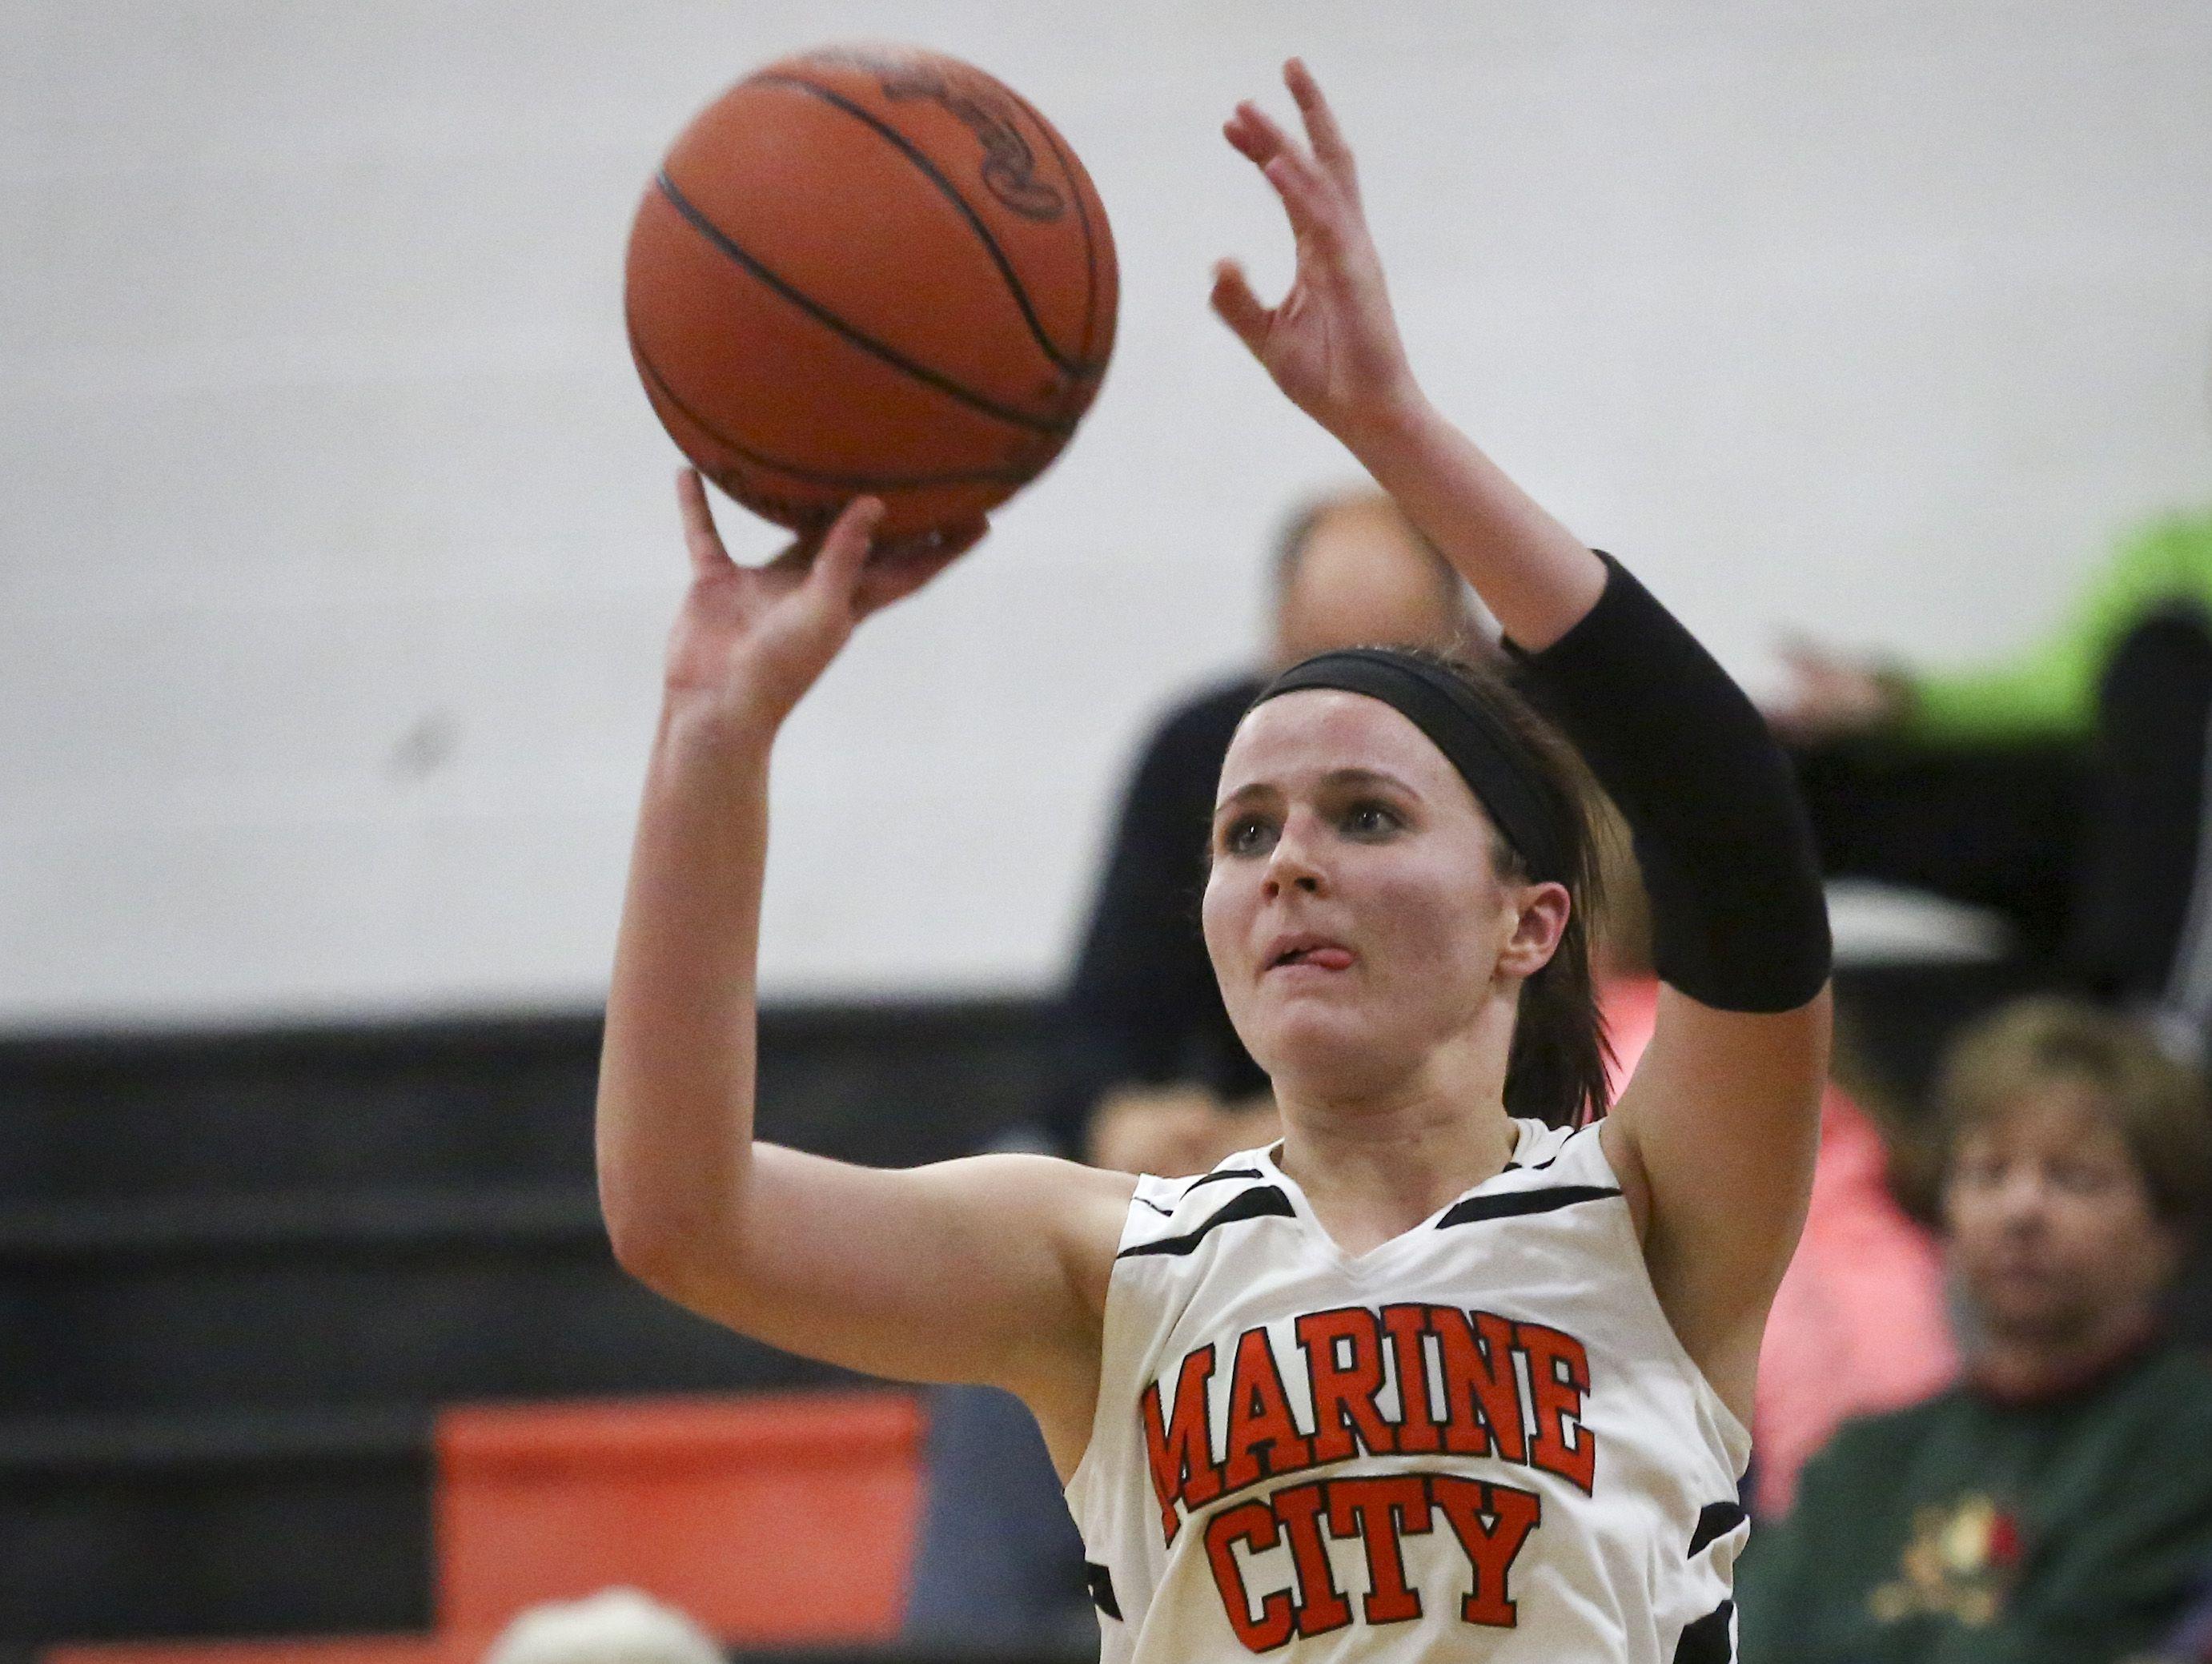 Marine City's Karyssa Austin takes a shot during a basketball game Tuesday, December 1, 2015 at Marine City High School.